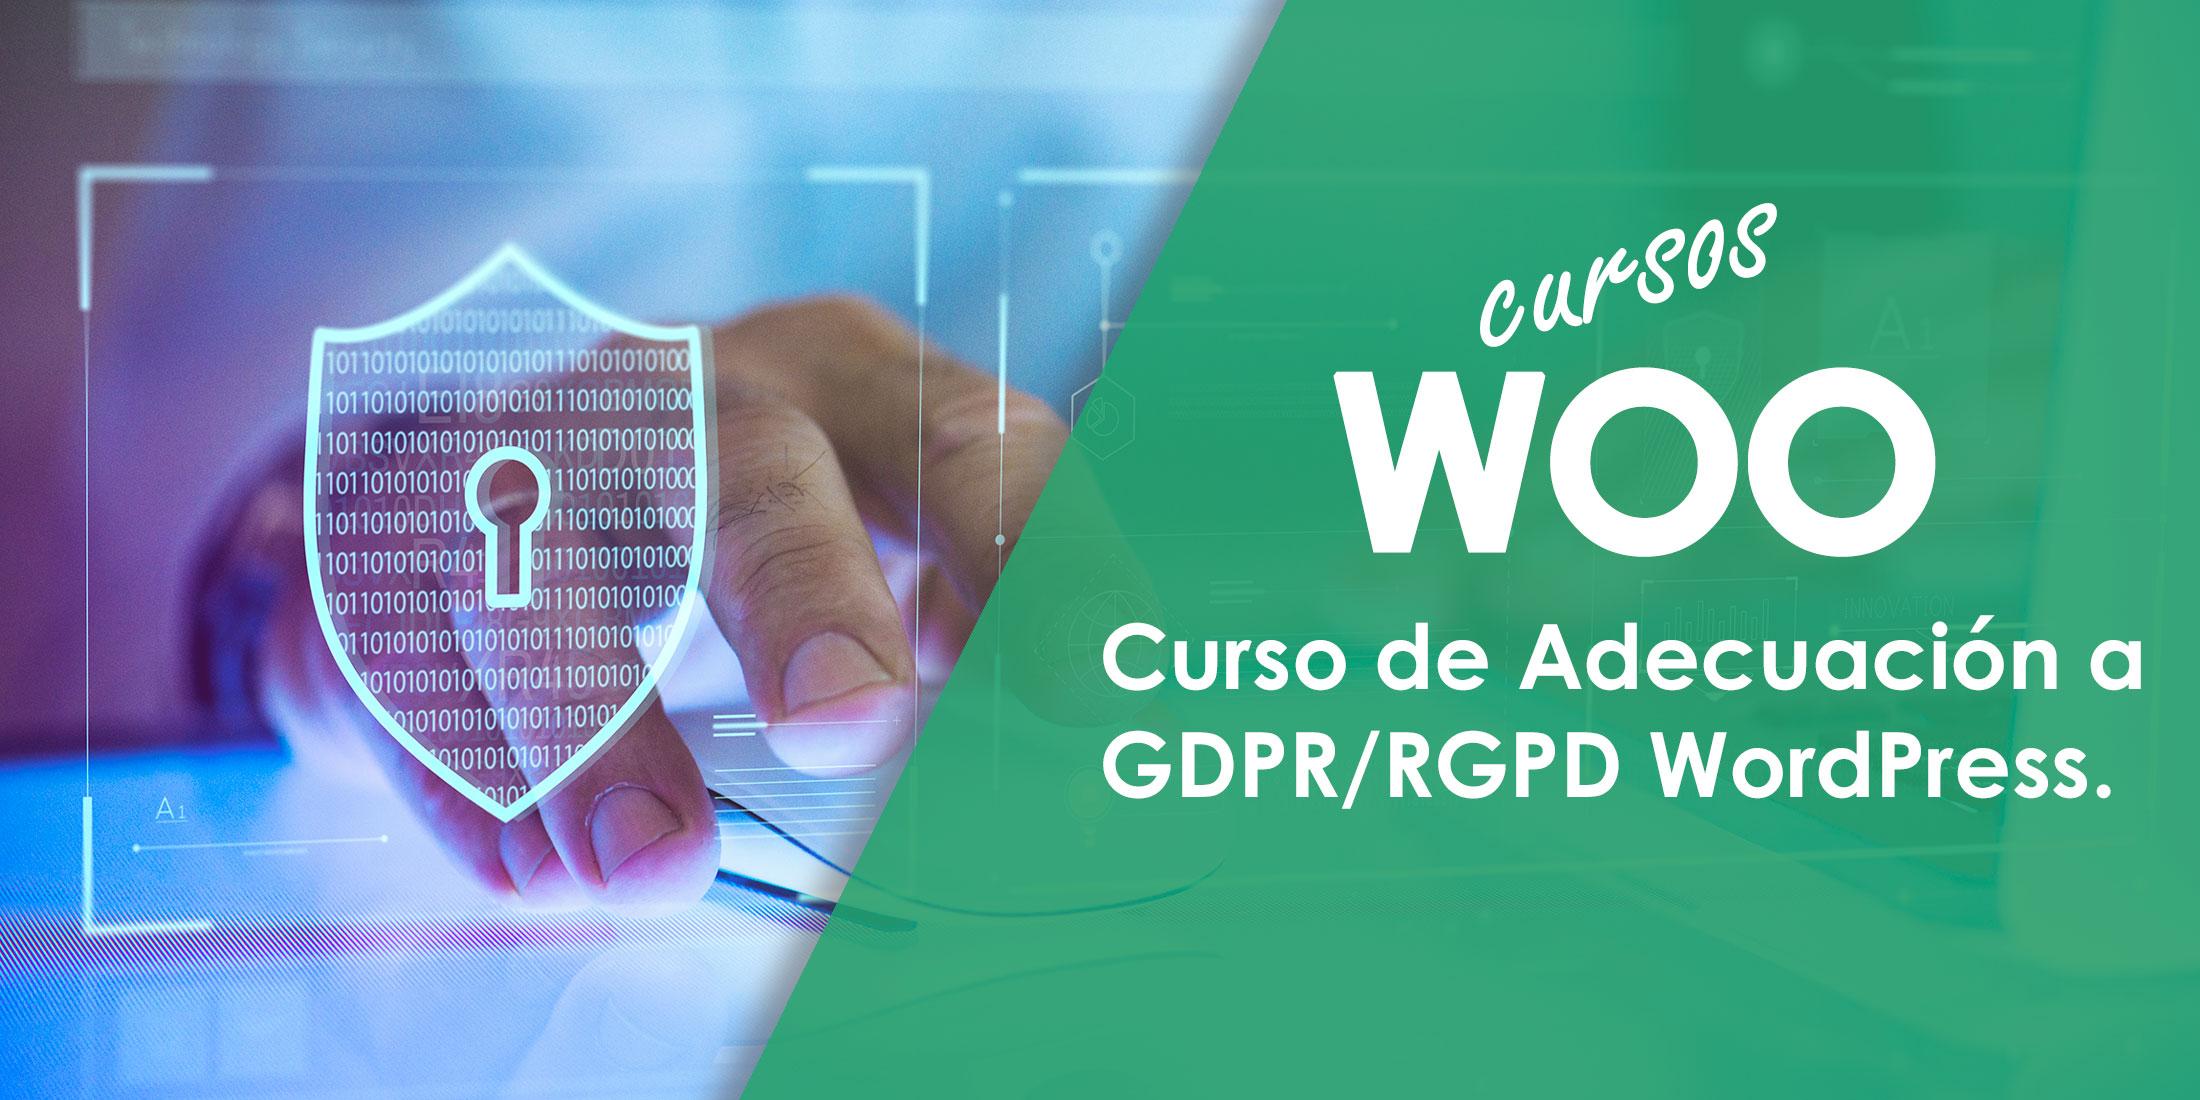 Curso de Adecuación a GDPR/RGPD WordPress